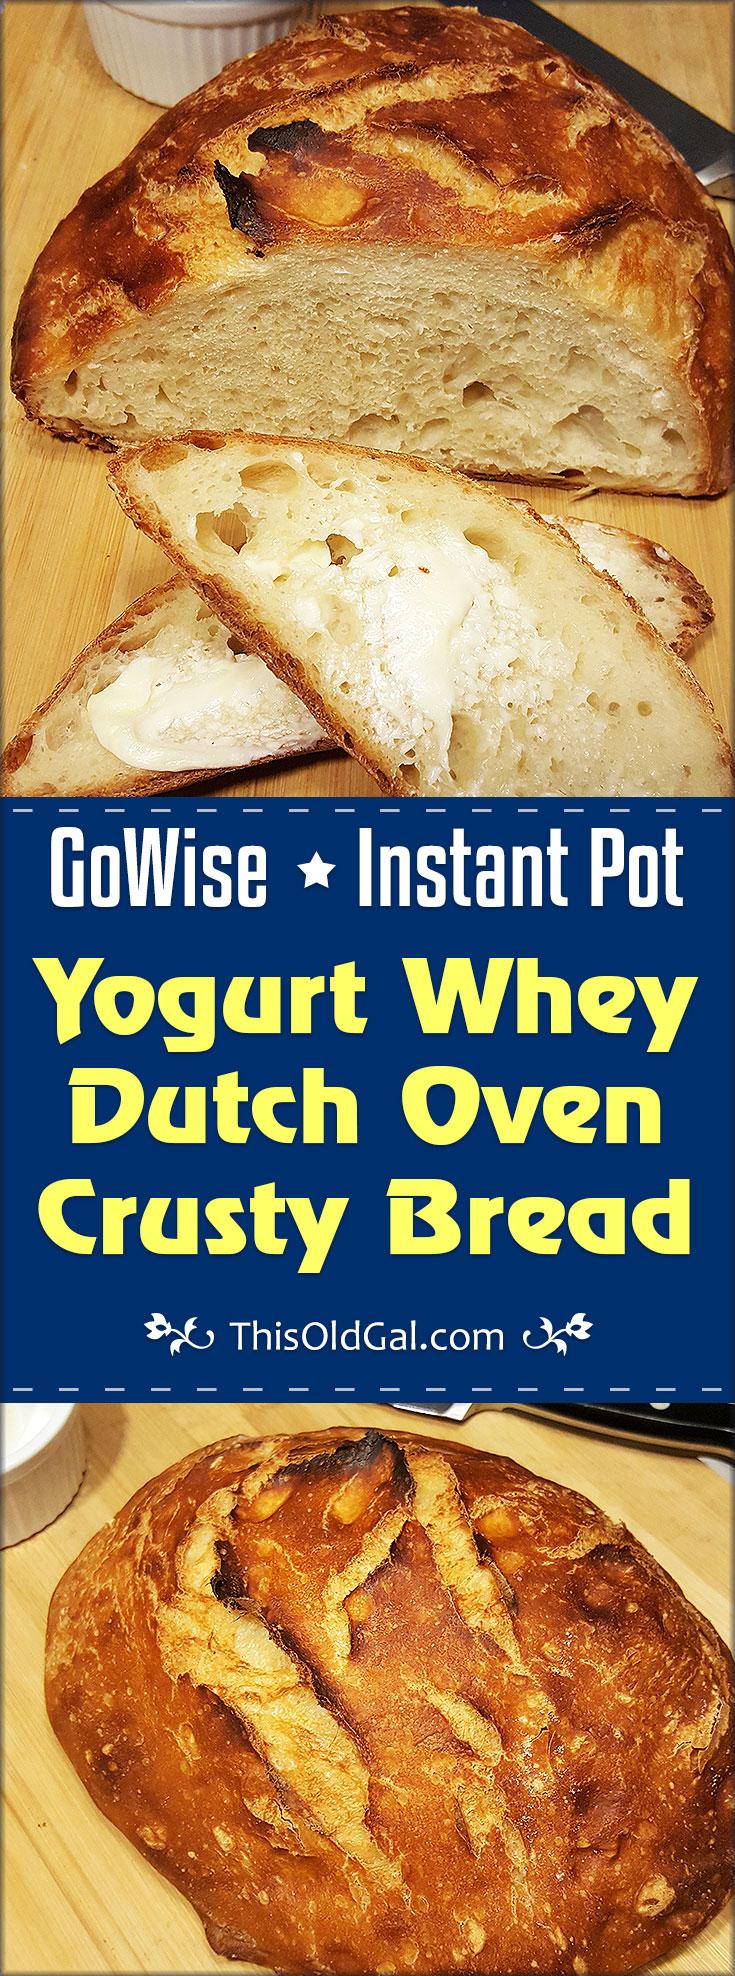 GoWise / Instant Pot Yogurt Whey Dutch Oven Crusty Bread